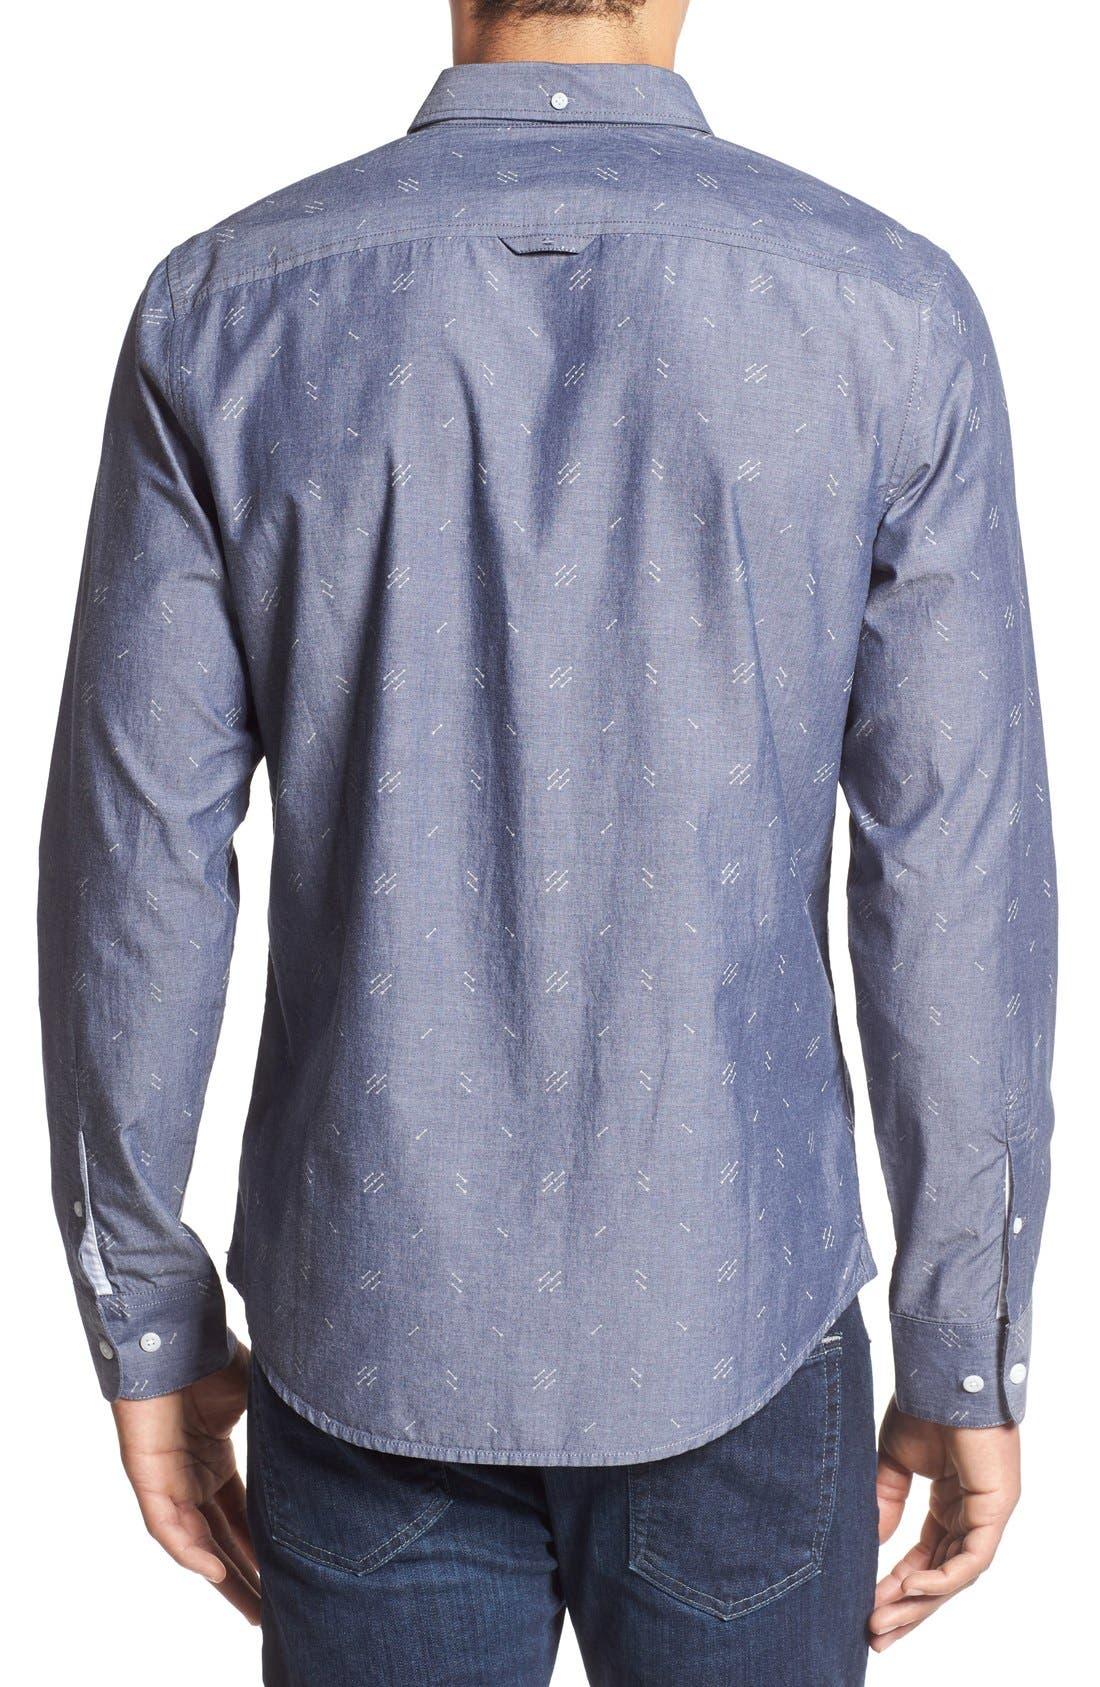 Alternate Image 2  - 1901 'Baker' Slim Fit Arrow Print Woven Shirt